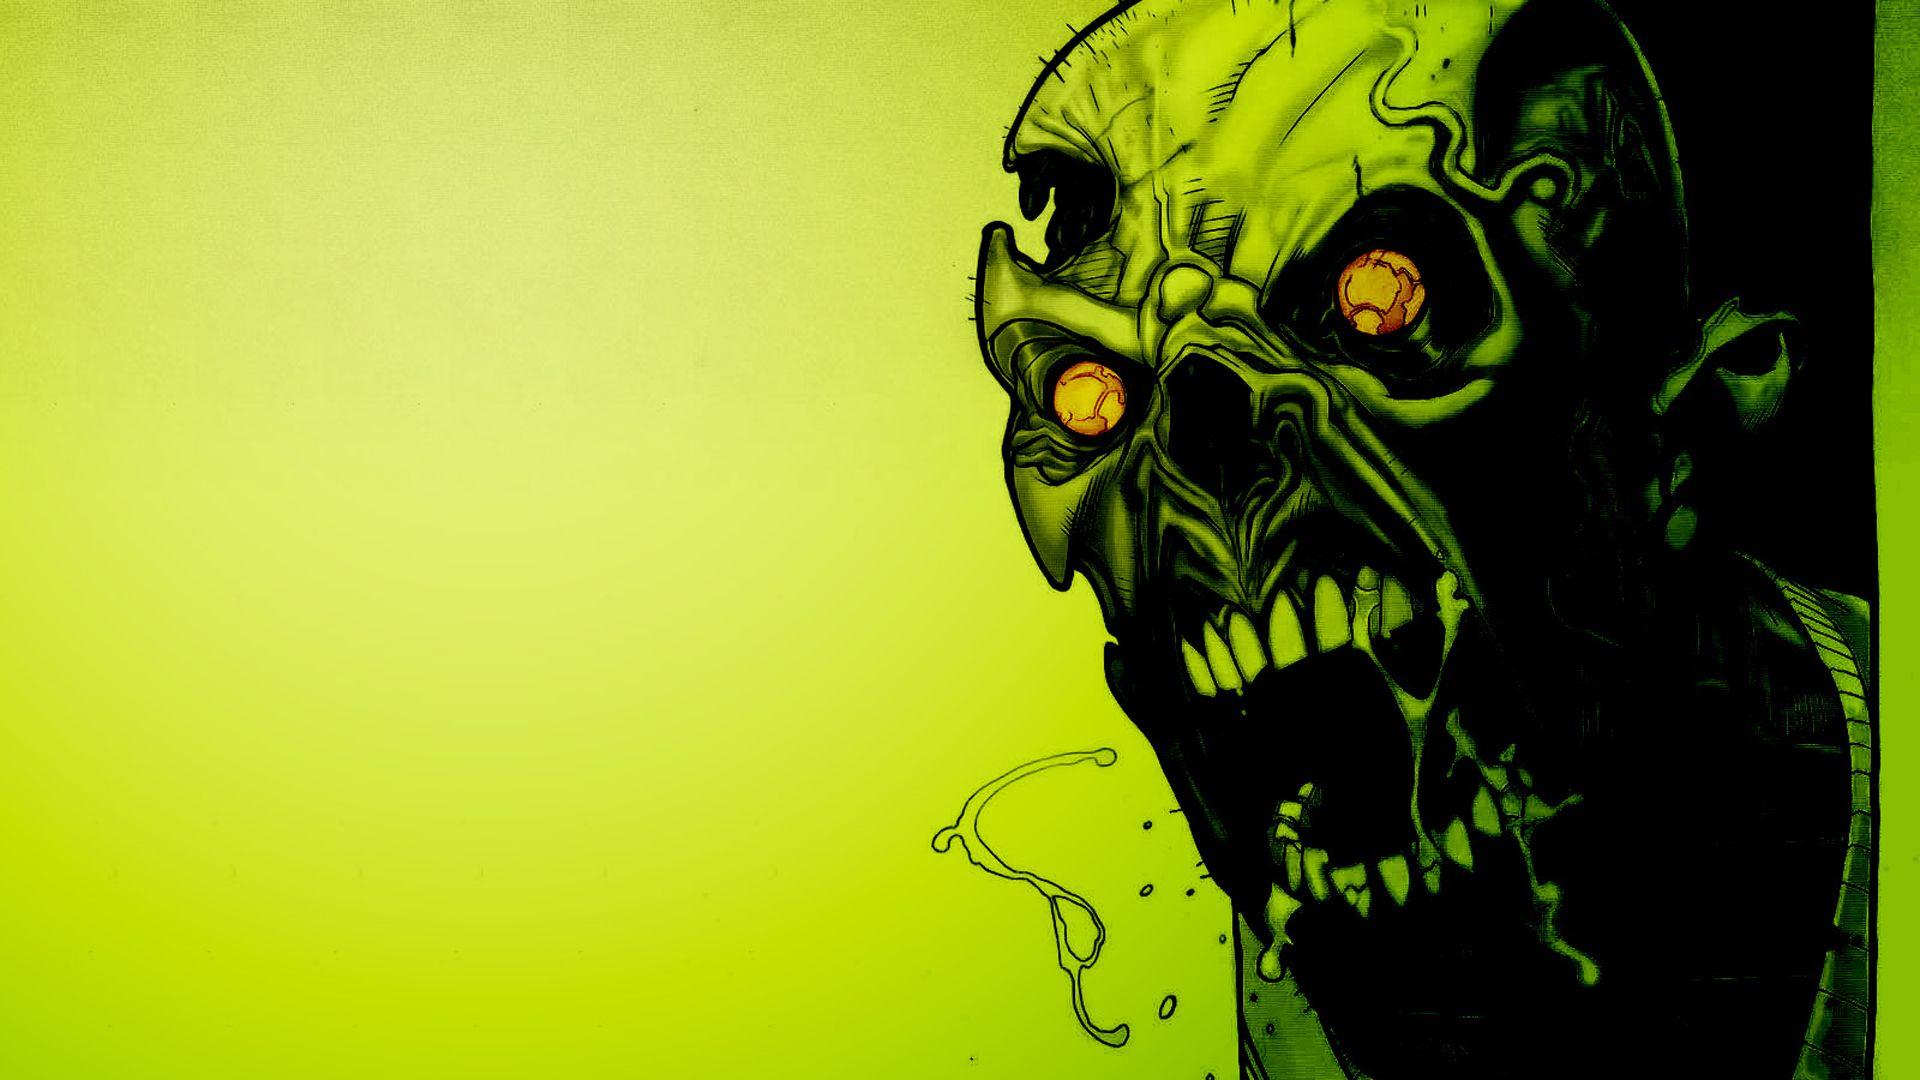 Yelling Zombie Z Cartoons In 2018 Pinterest Zombie Wallpaper